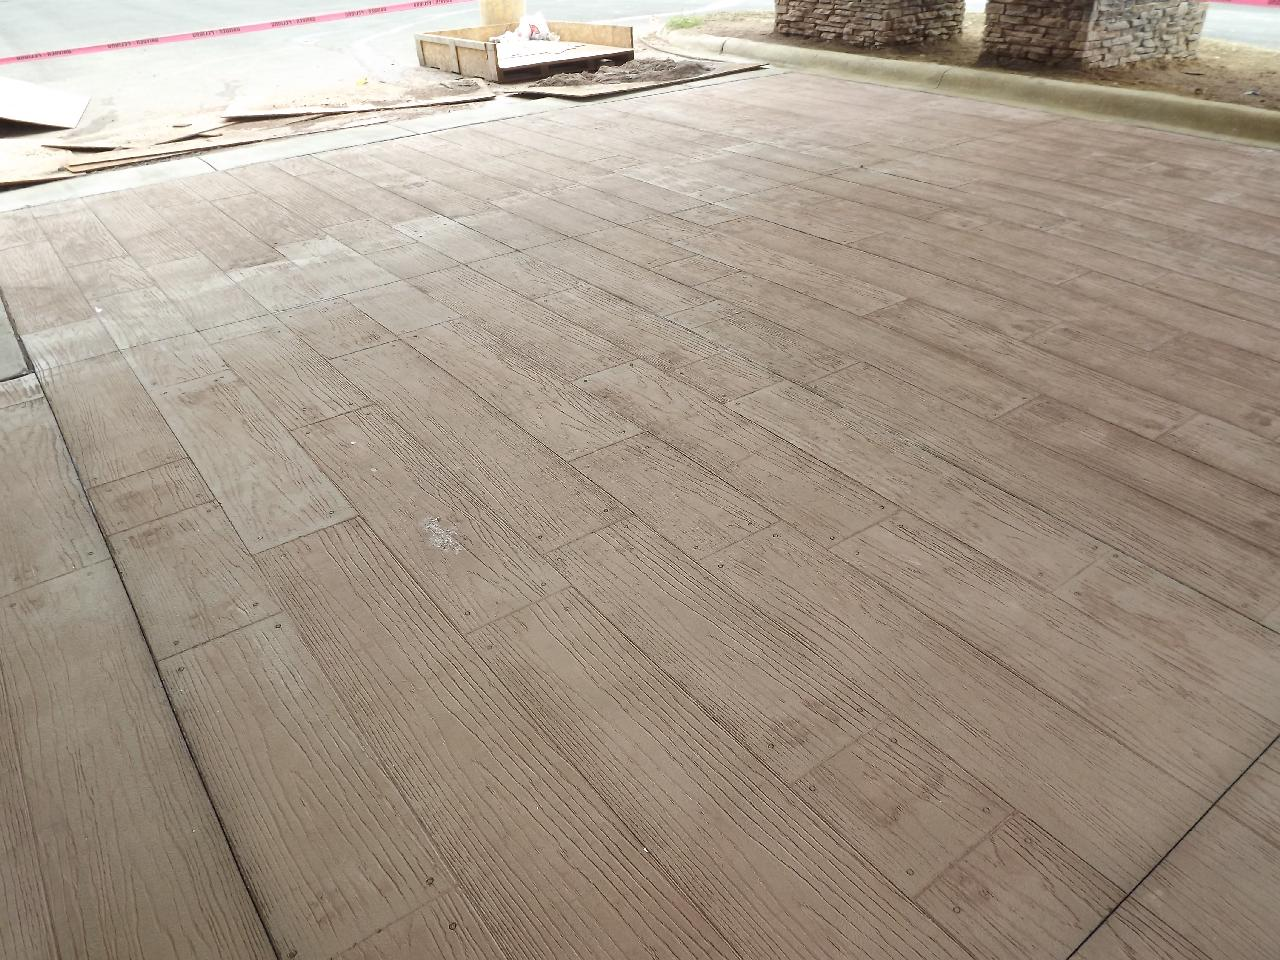 Wood Plank Stamped Concrete Floors : Atlantic coast concrete hampton inn greensboro wood plank